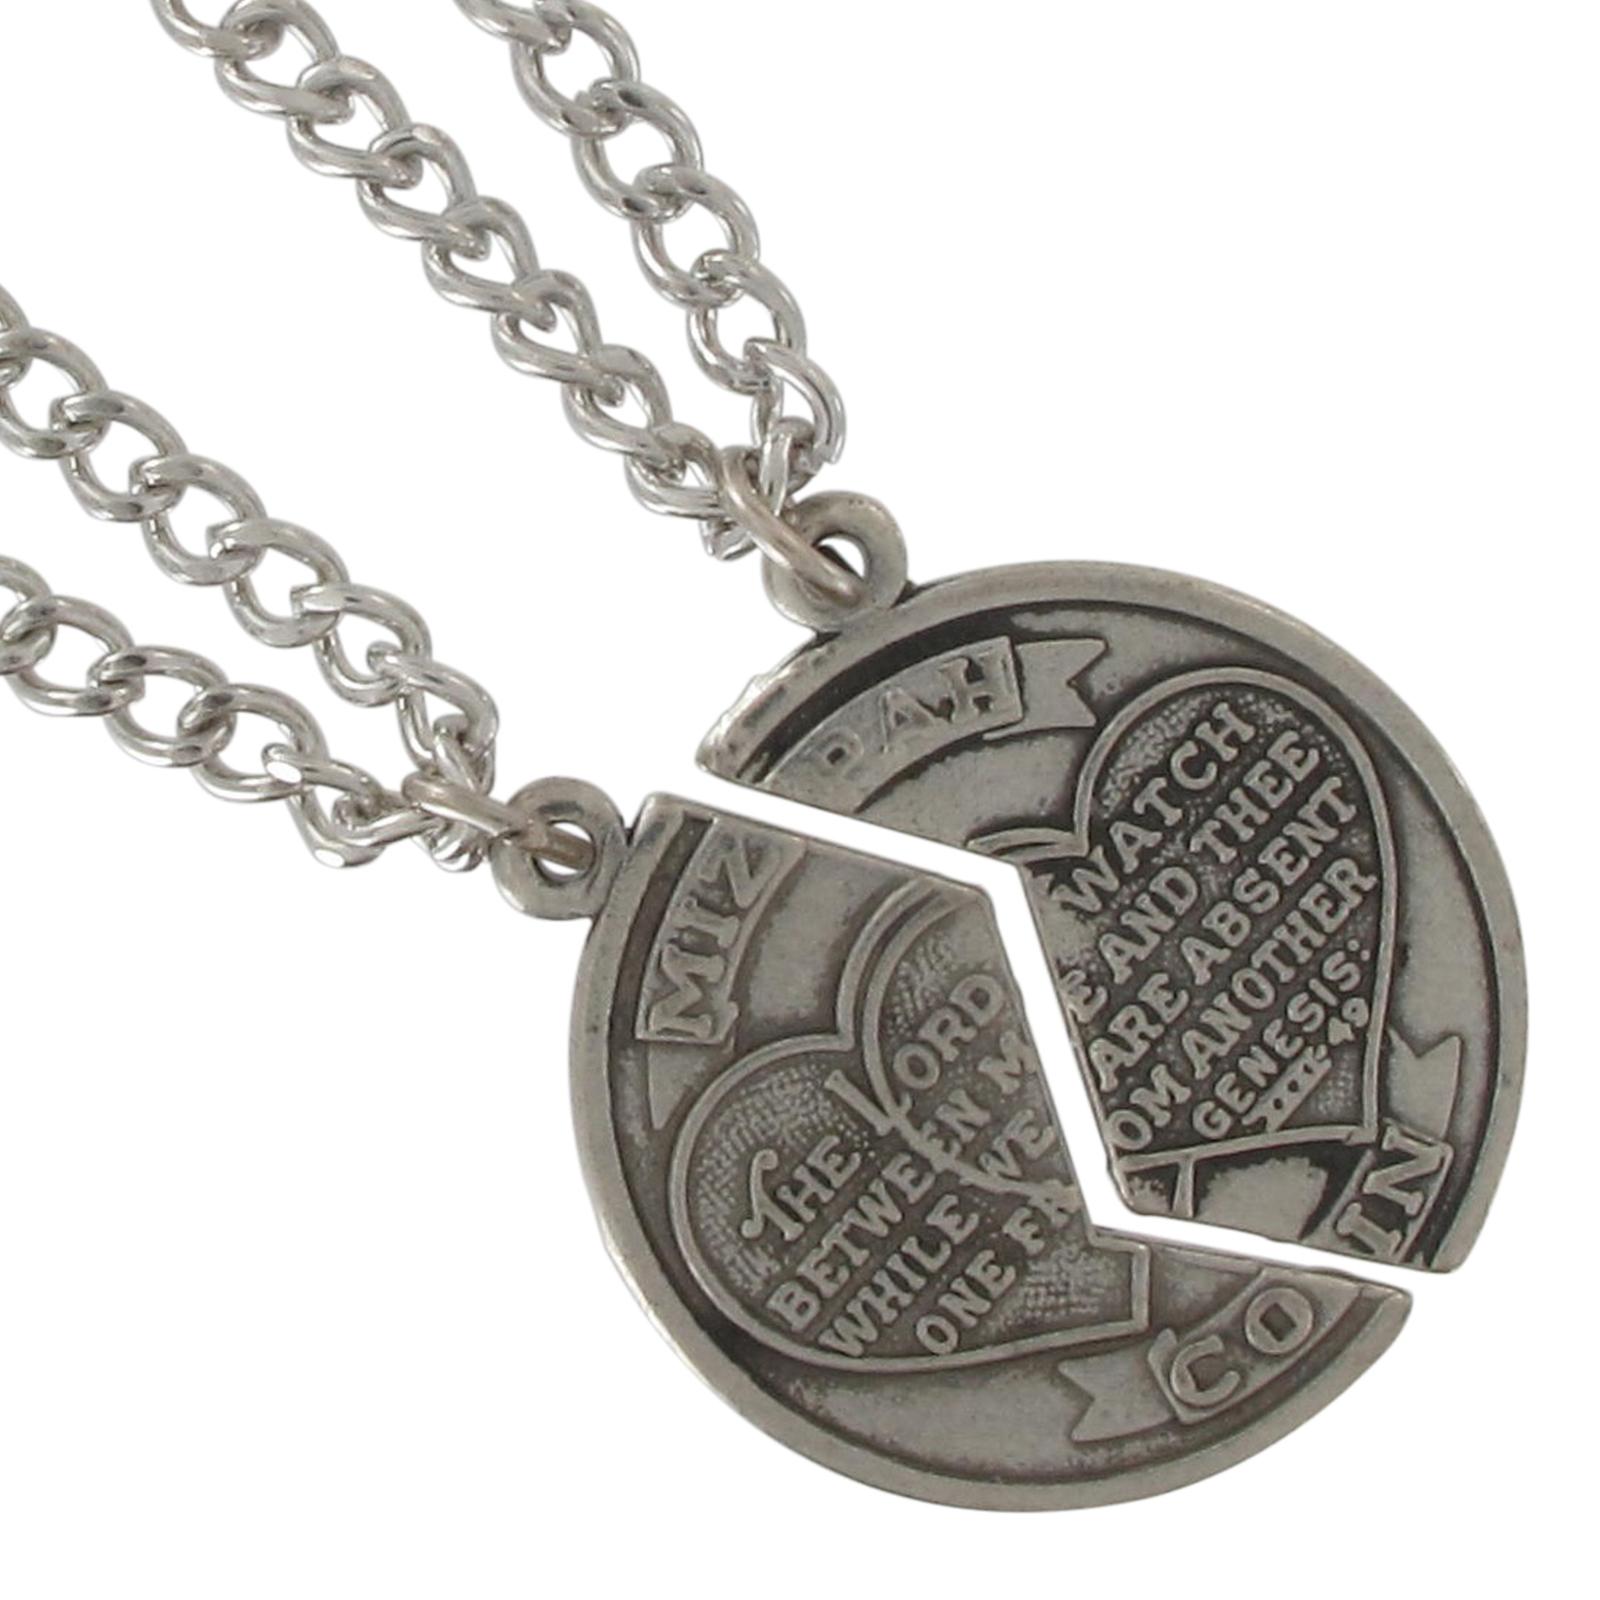 Mizpah coin necklace mizpah coin necklace can all downloads on the mizpah coin necklace mizpah coin necklace can all downloads on the site nlcupc aloadofball Choice Image